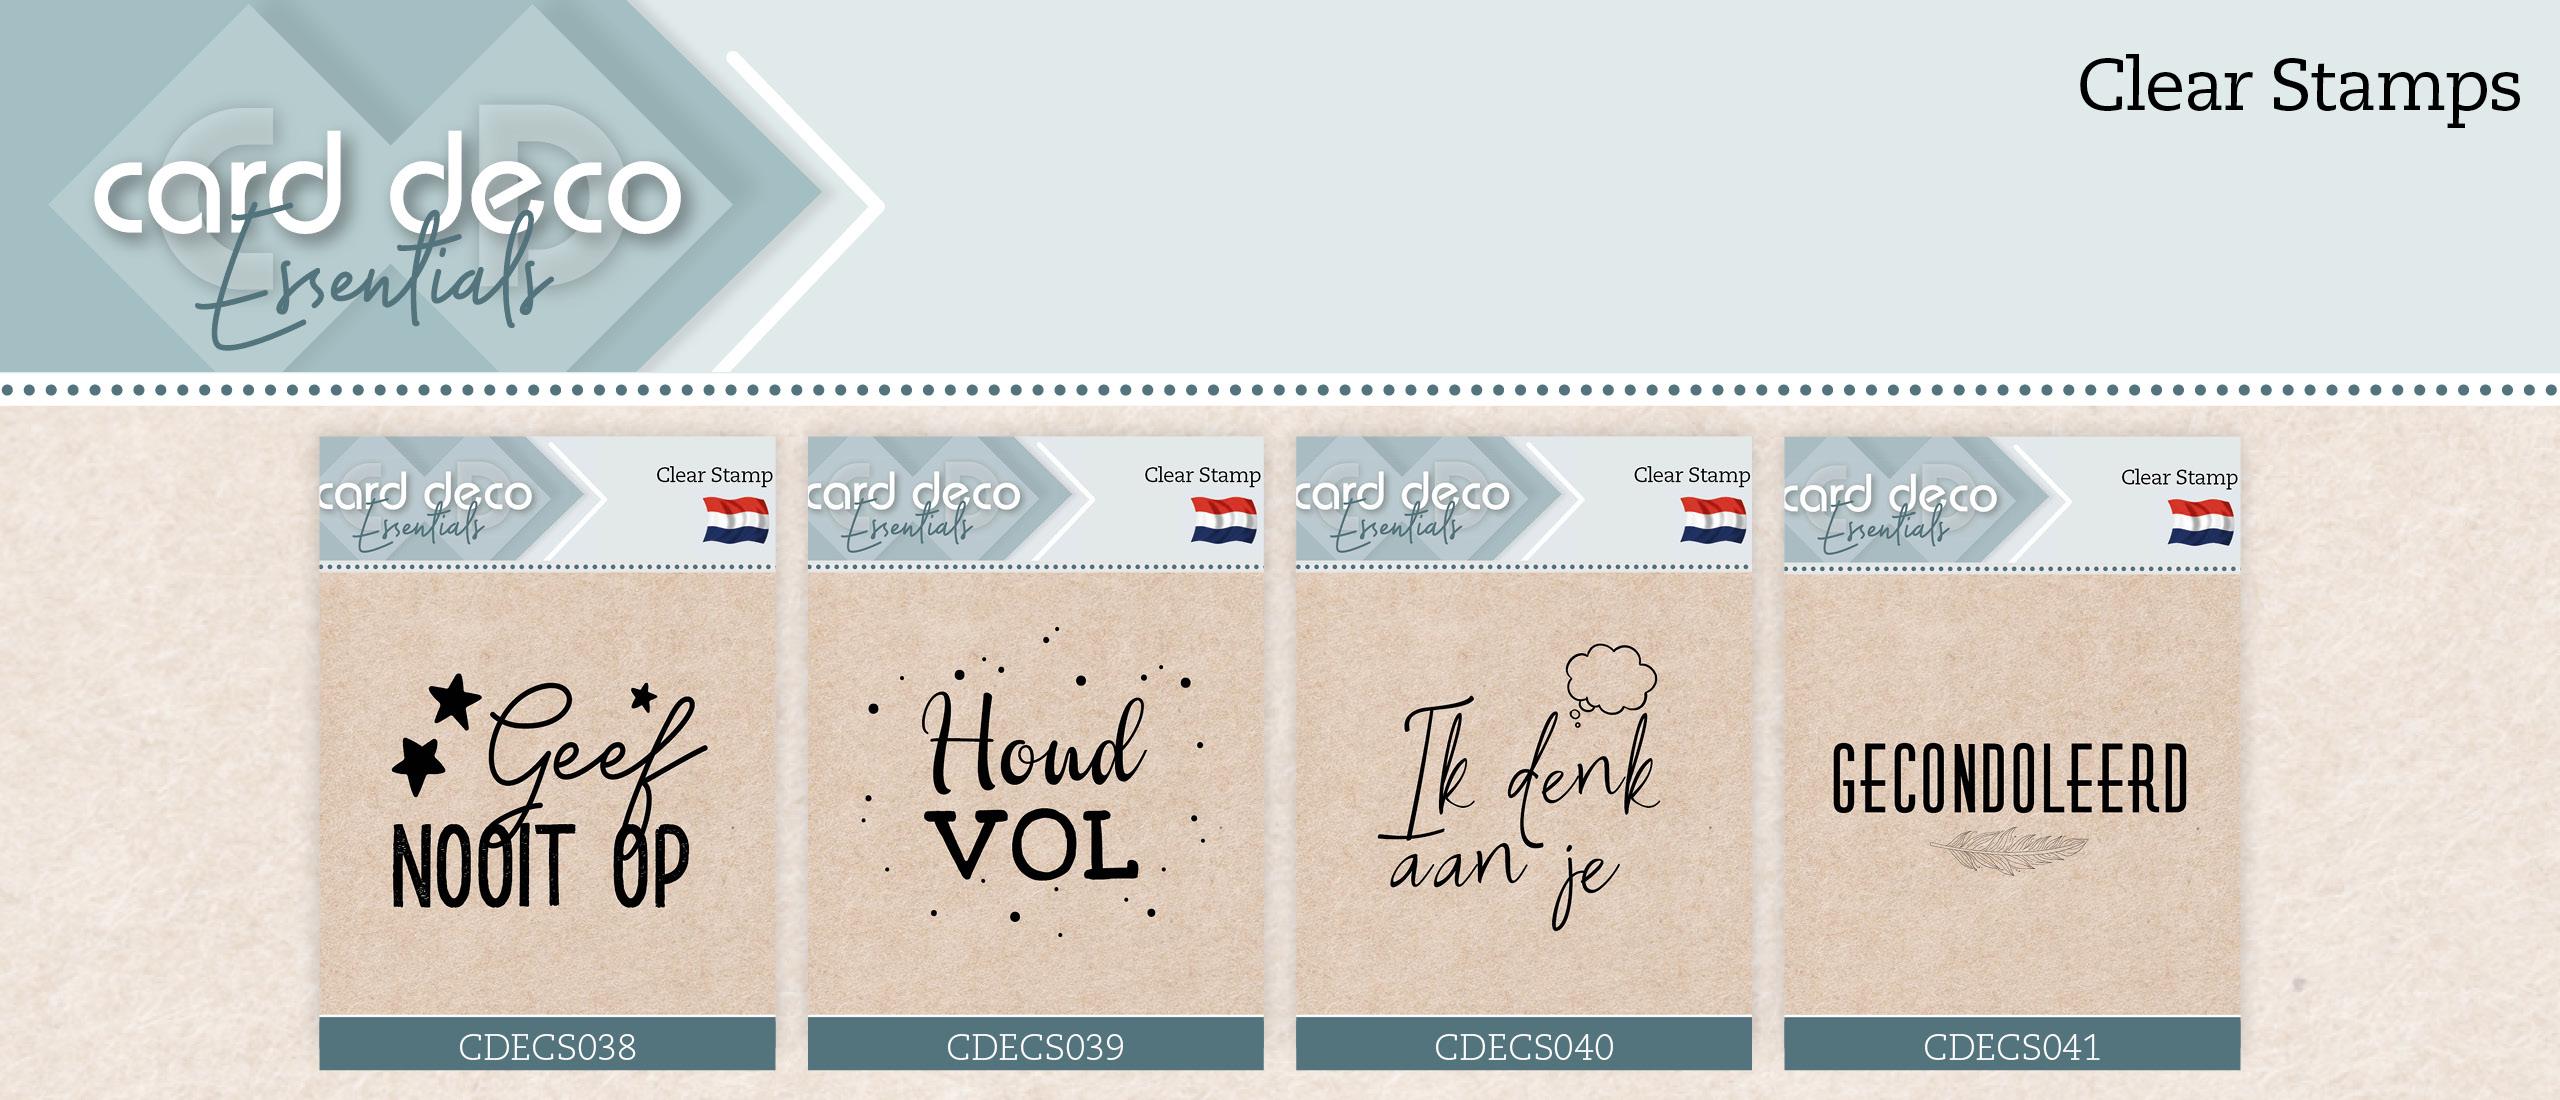 Card Deco Essentials Clearstamps CDECS038 t/m CDECS041